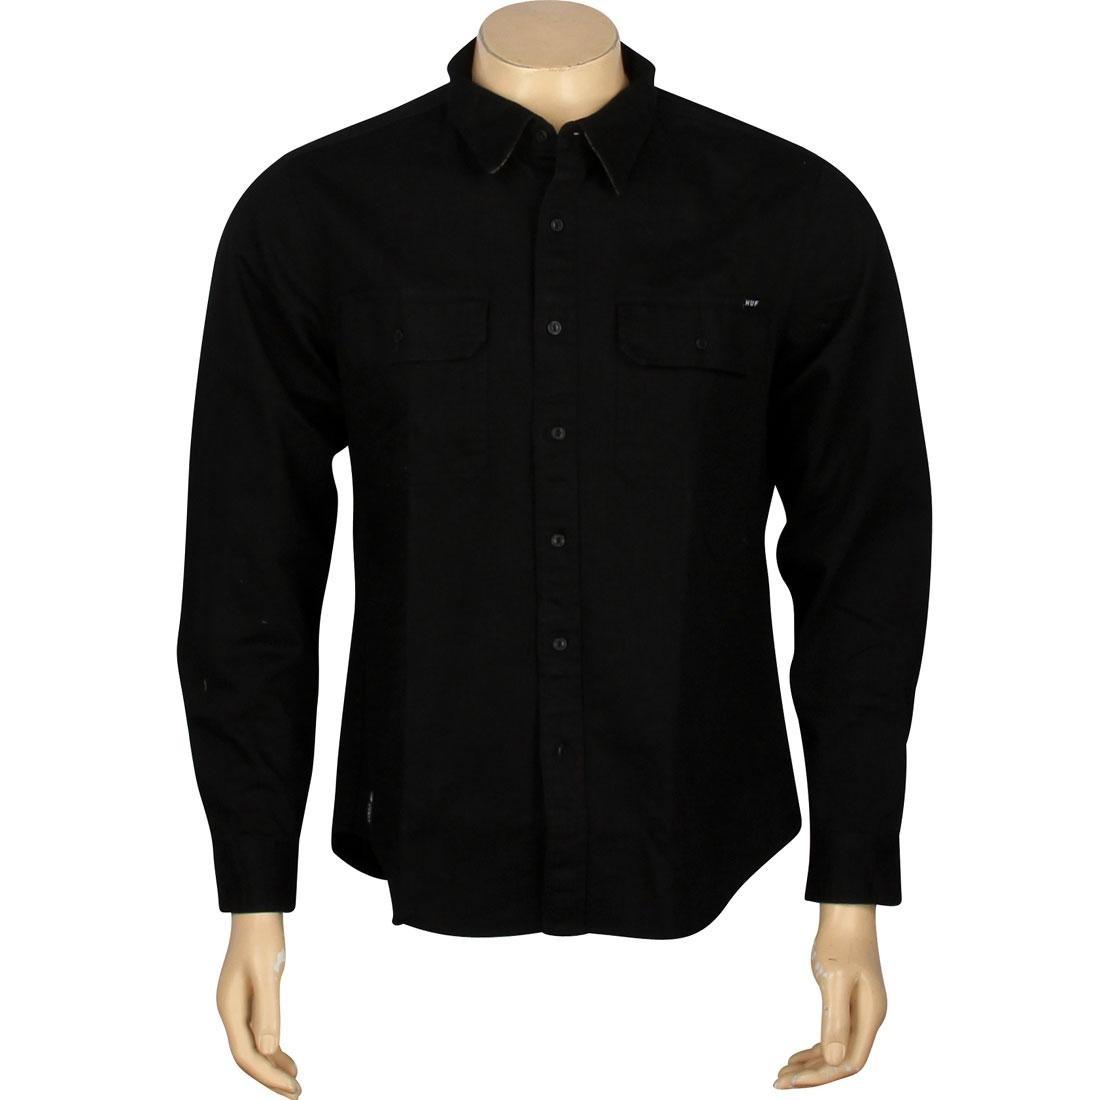 HUF ハフ スリーブ 黒 ブラック 【 HUF SLEEVE BLACK POTRERO LONG SHIRT 】 メンズファッション トップス カジュアルシャツ